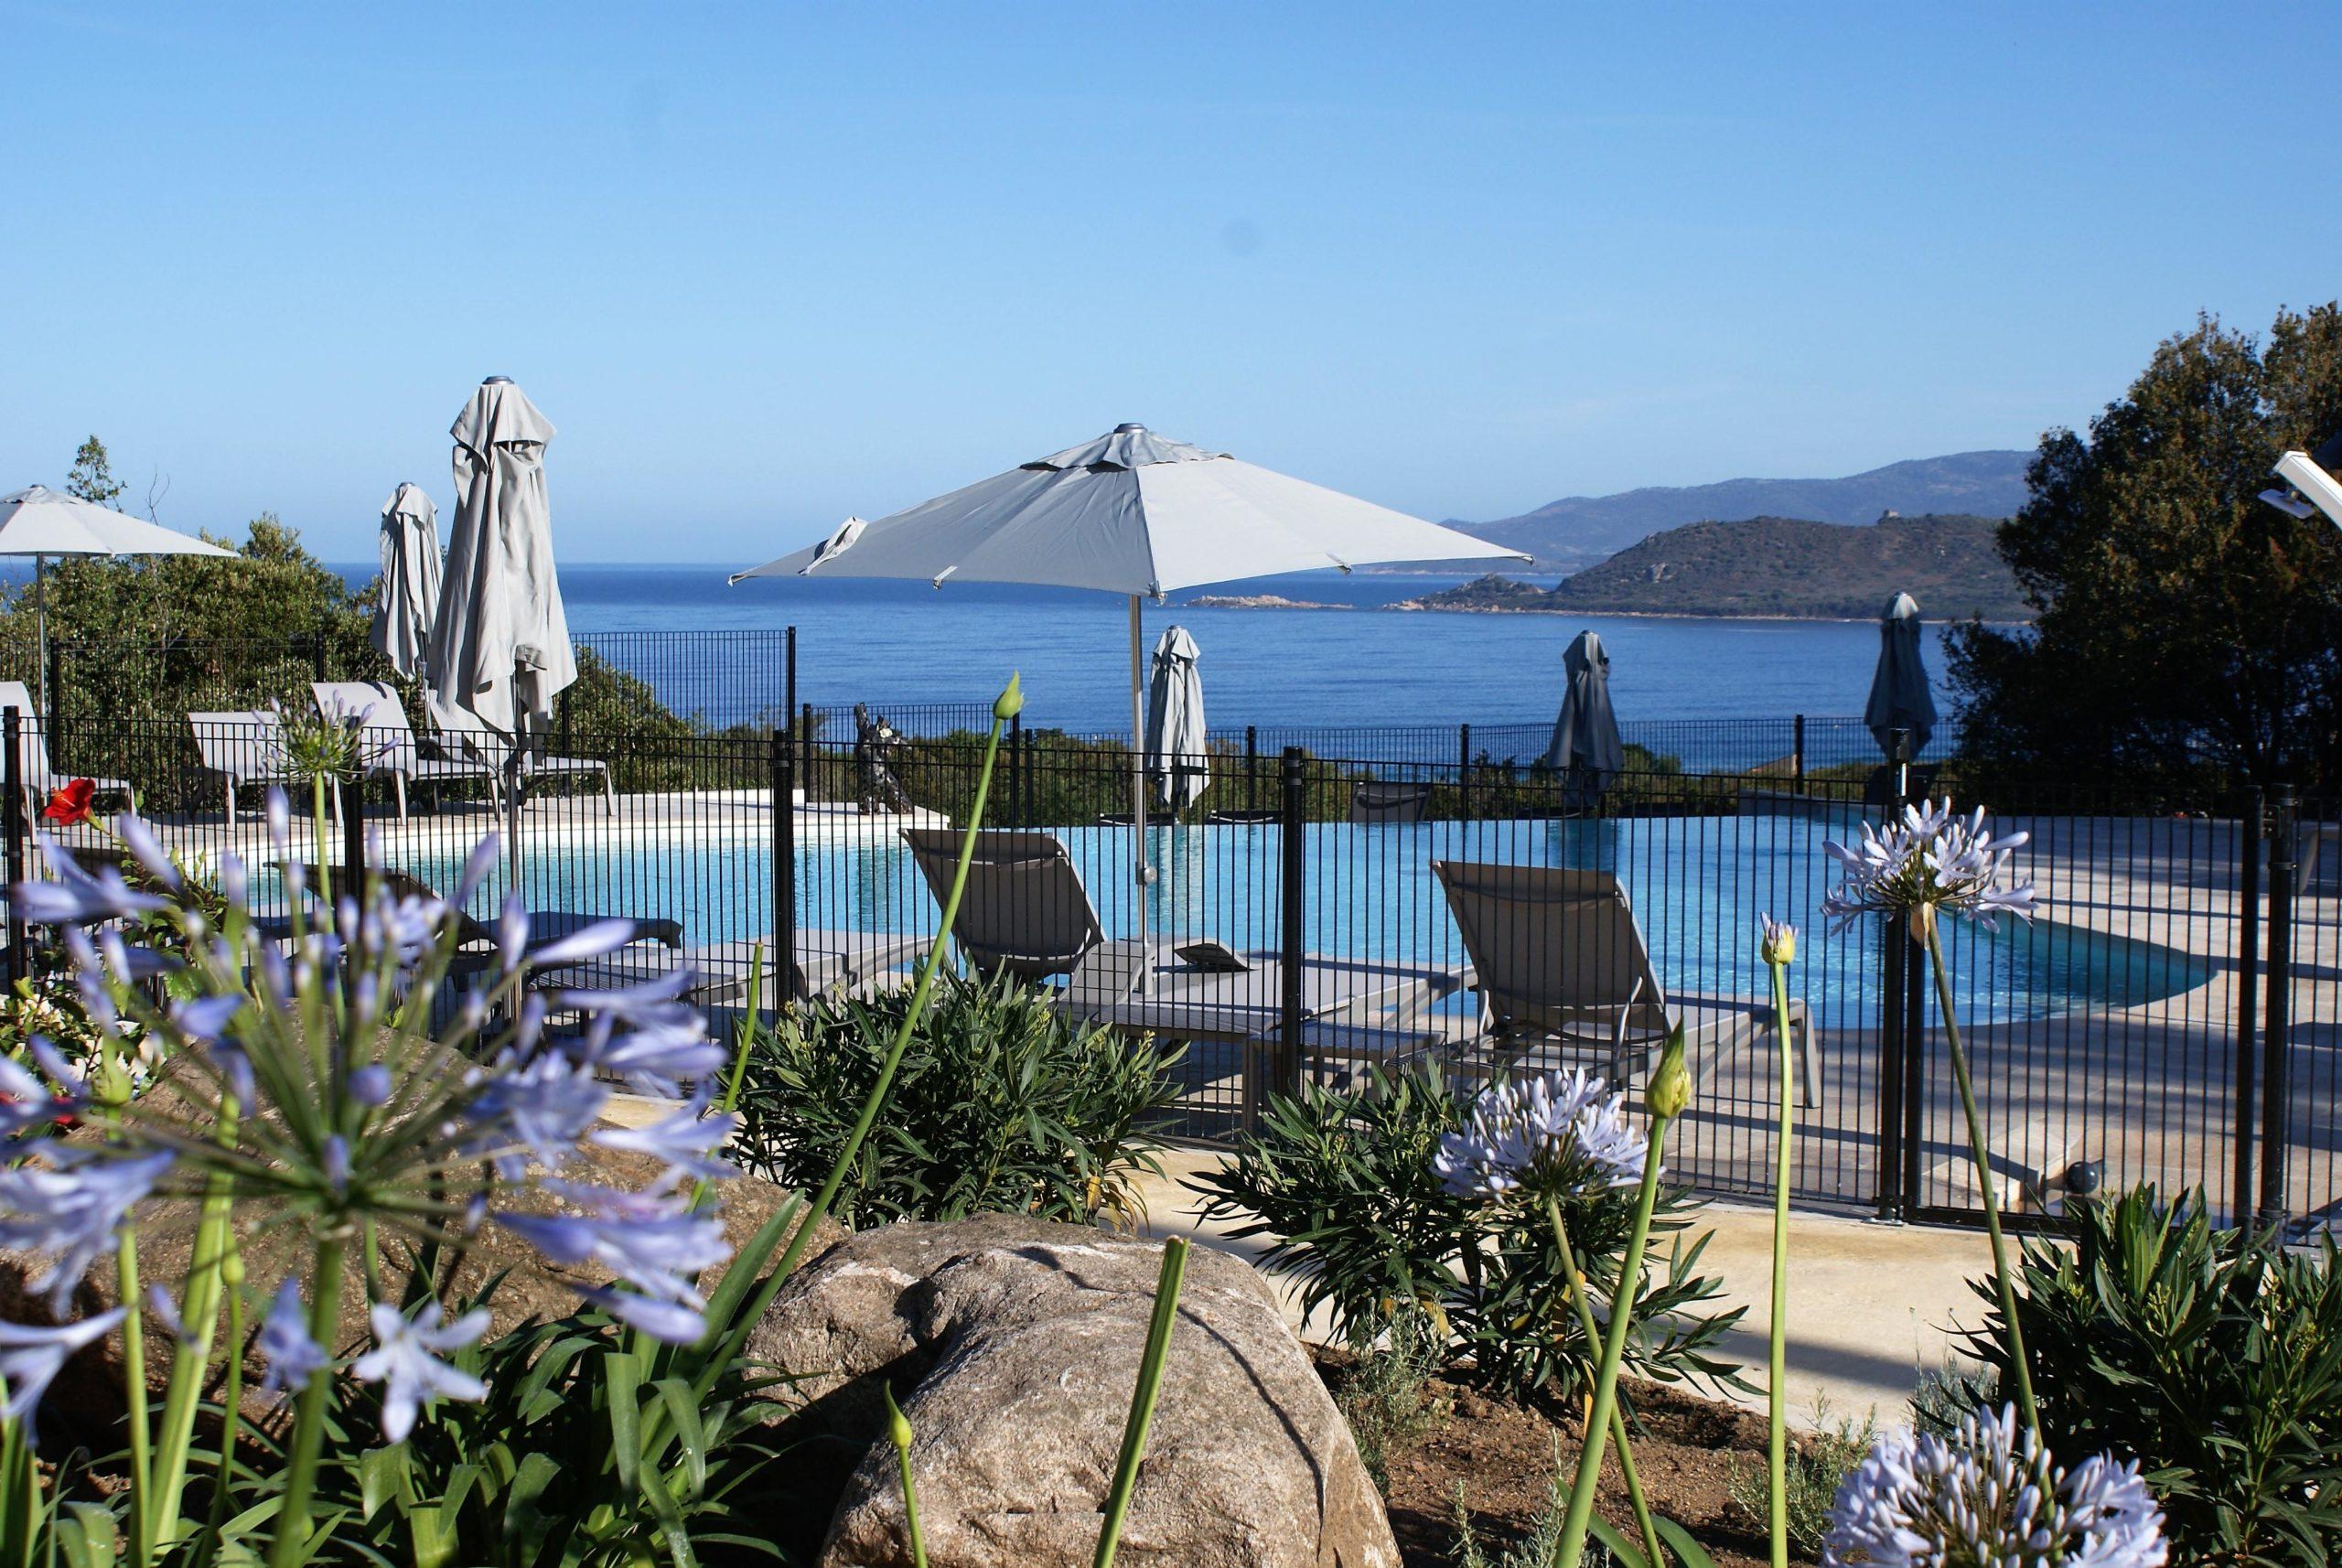 Camping-lacasa-bahia-modulo-zwembad